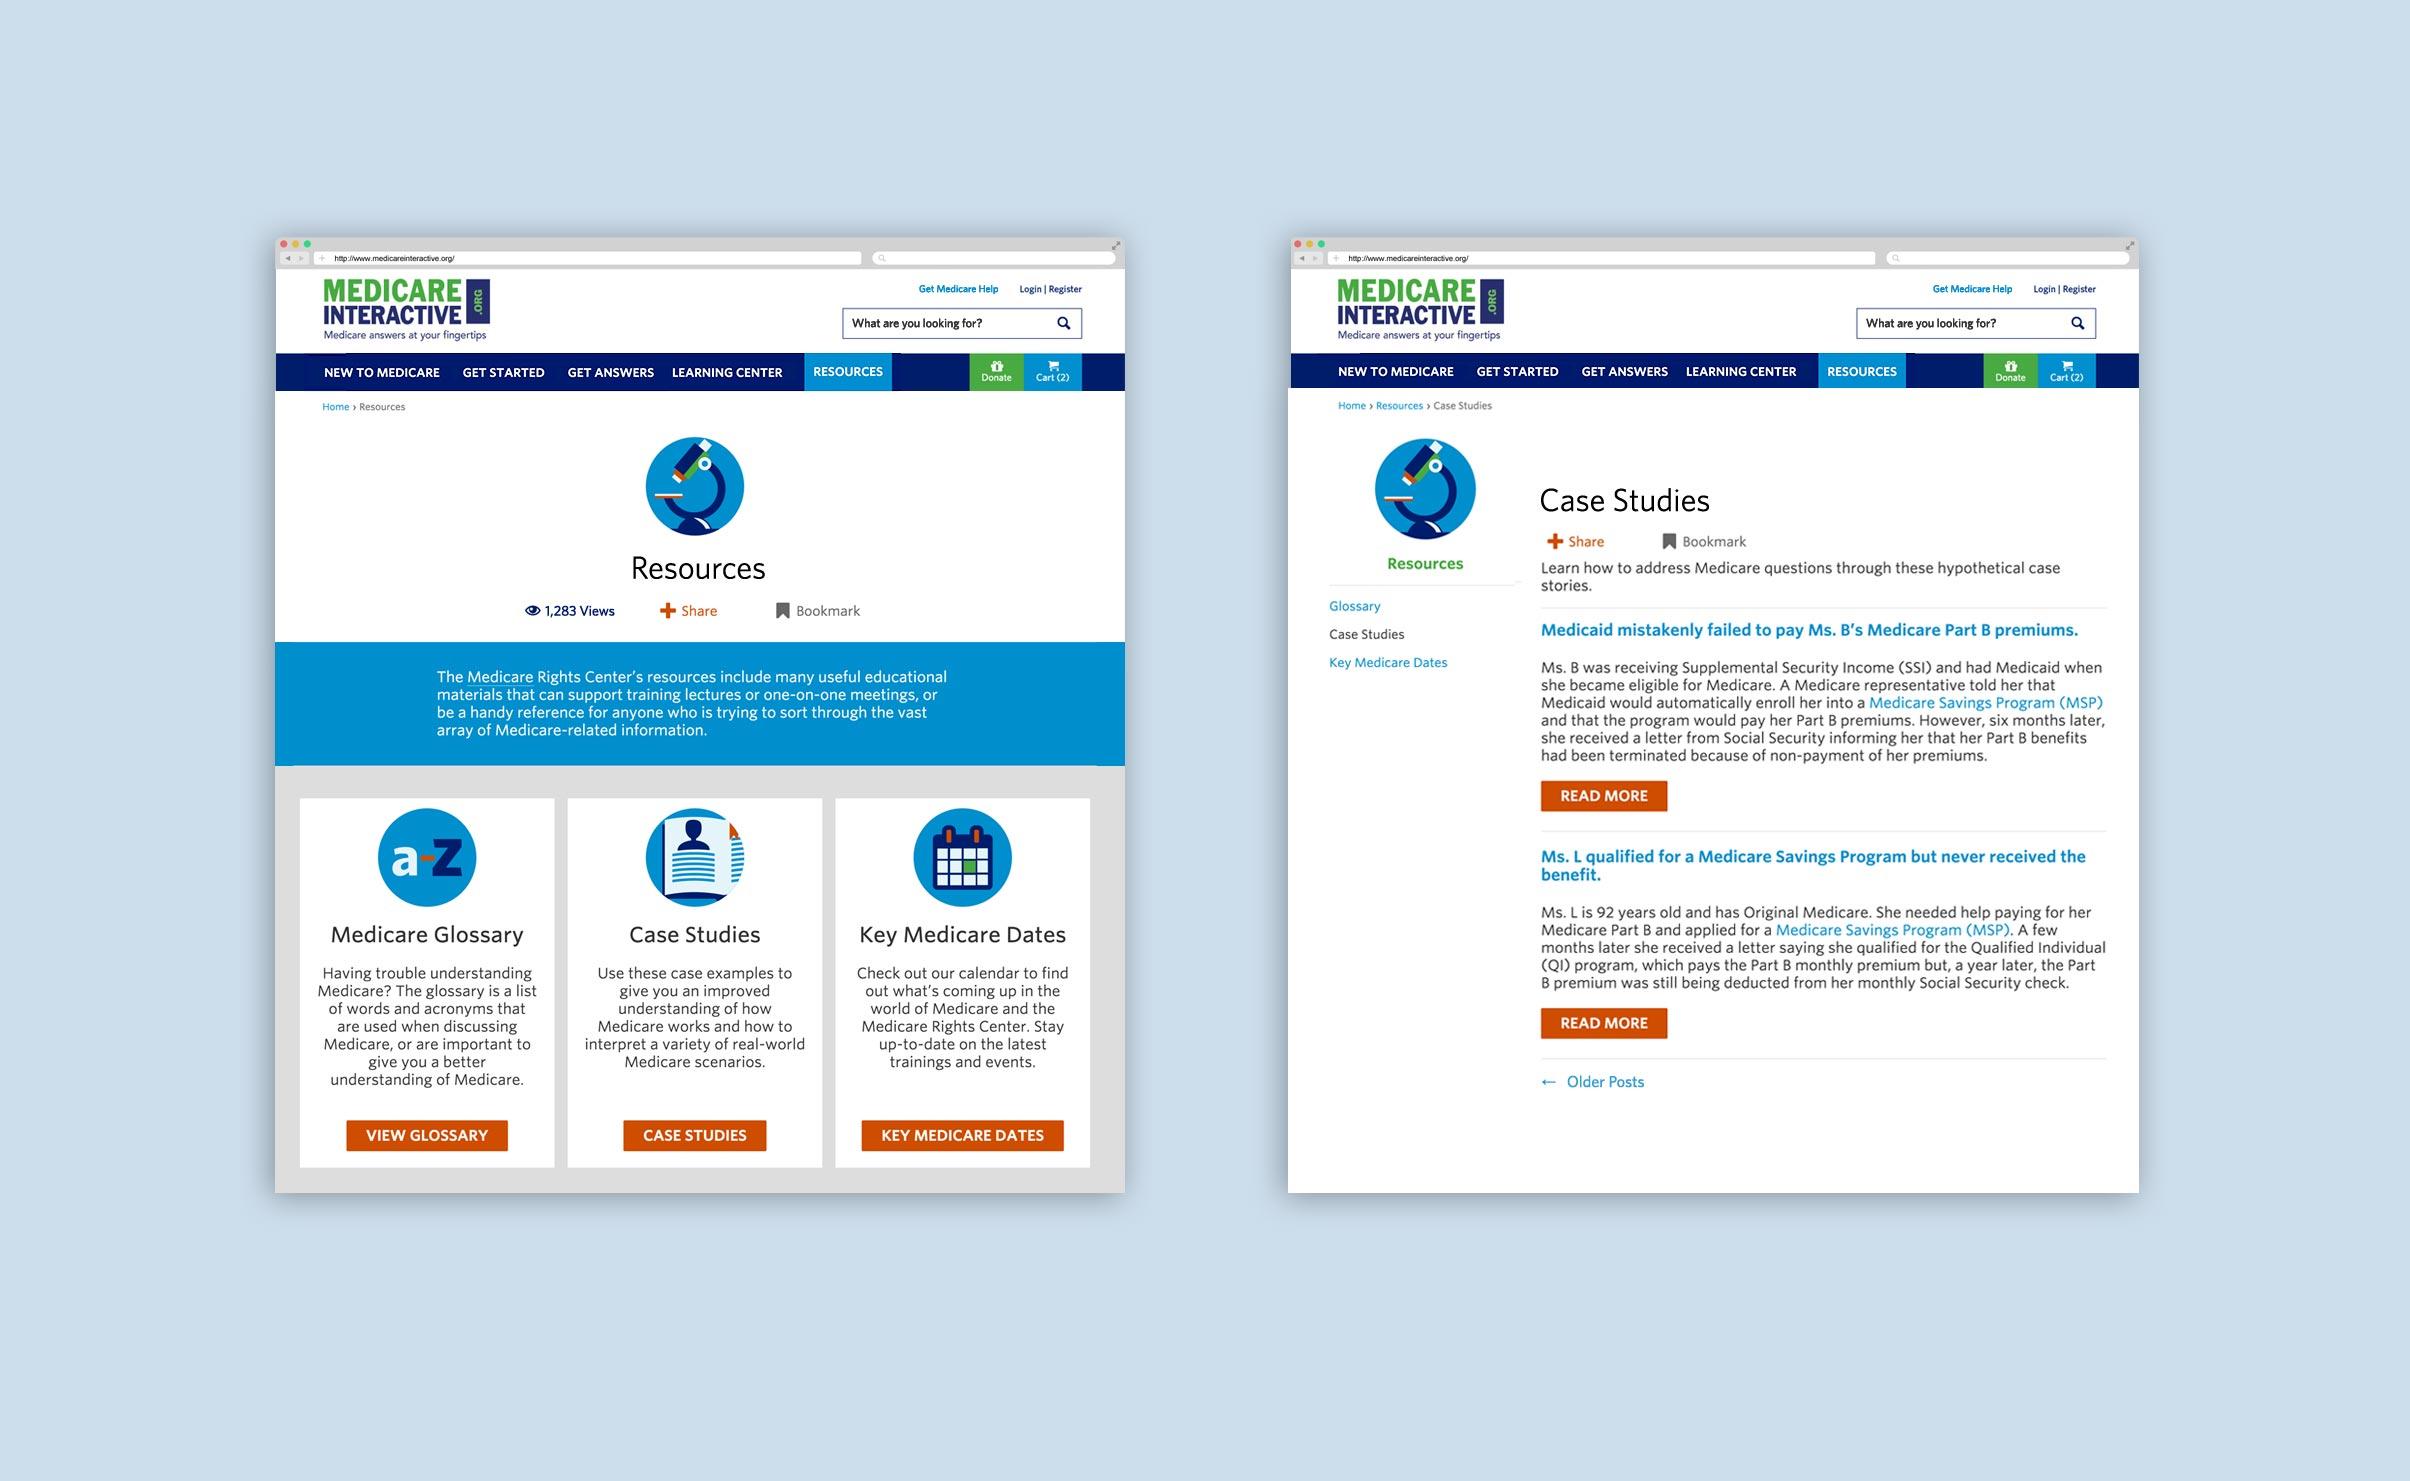 Medicare Interactive Desktop Screens